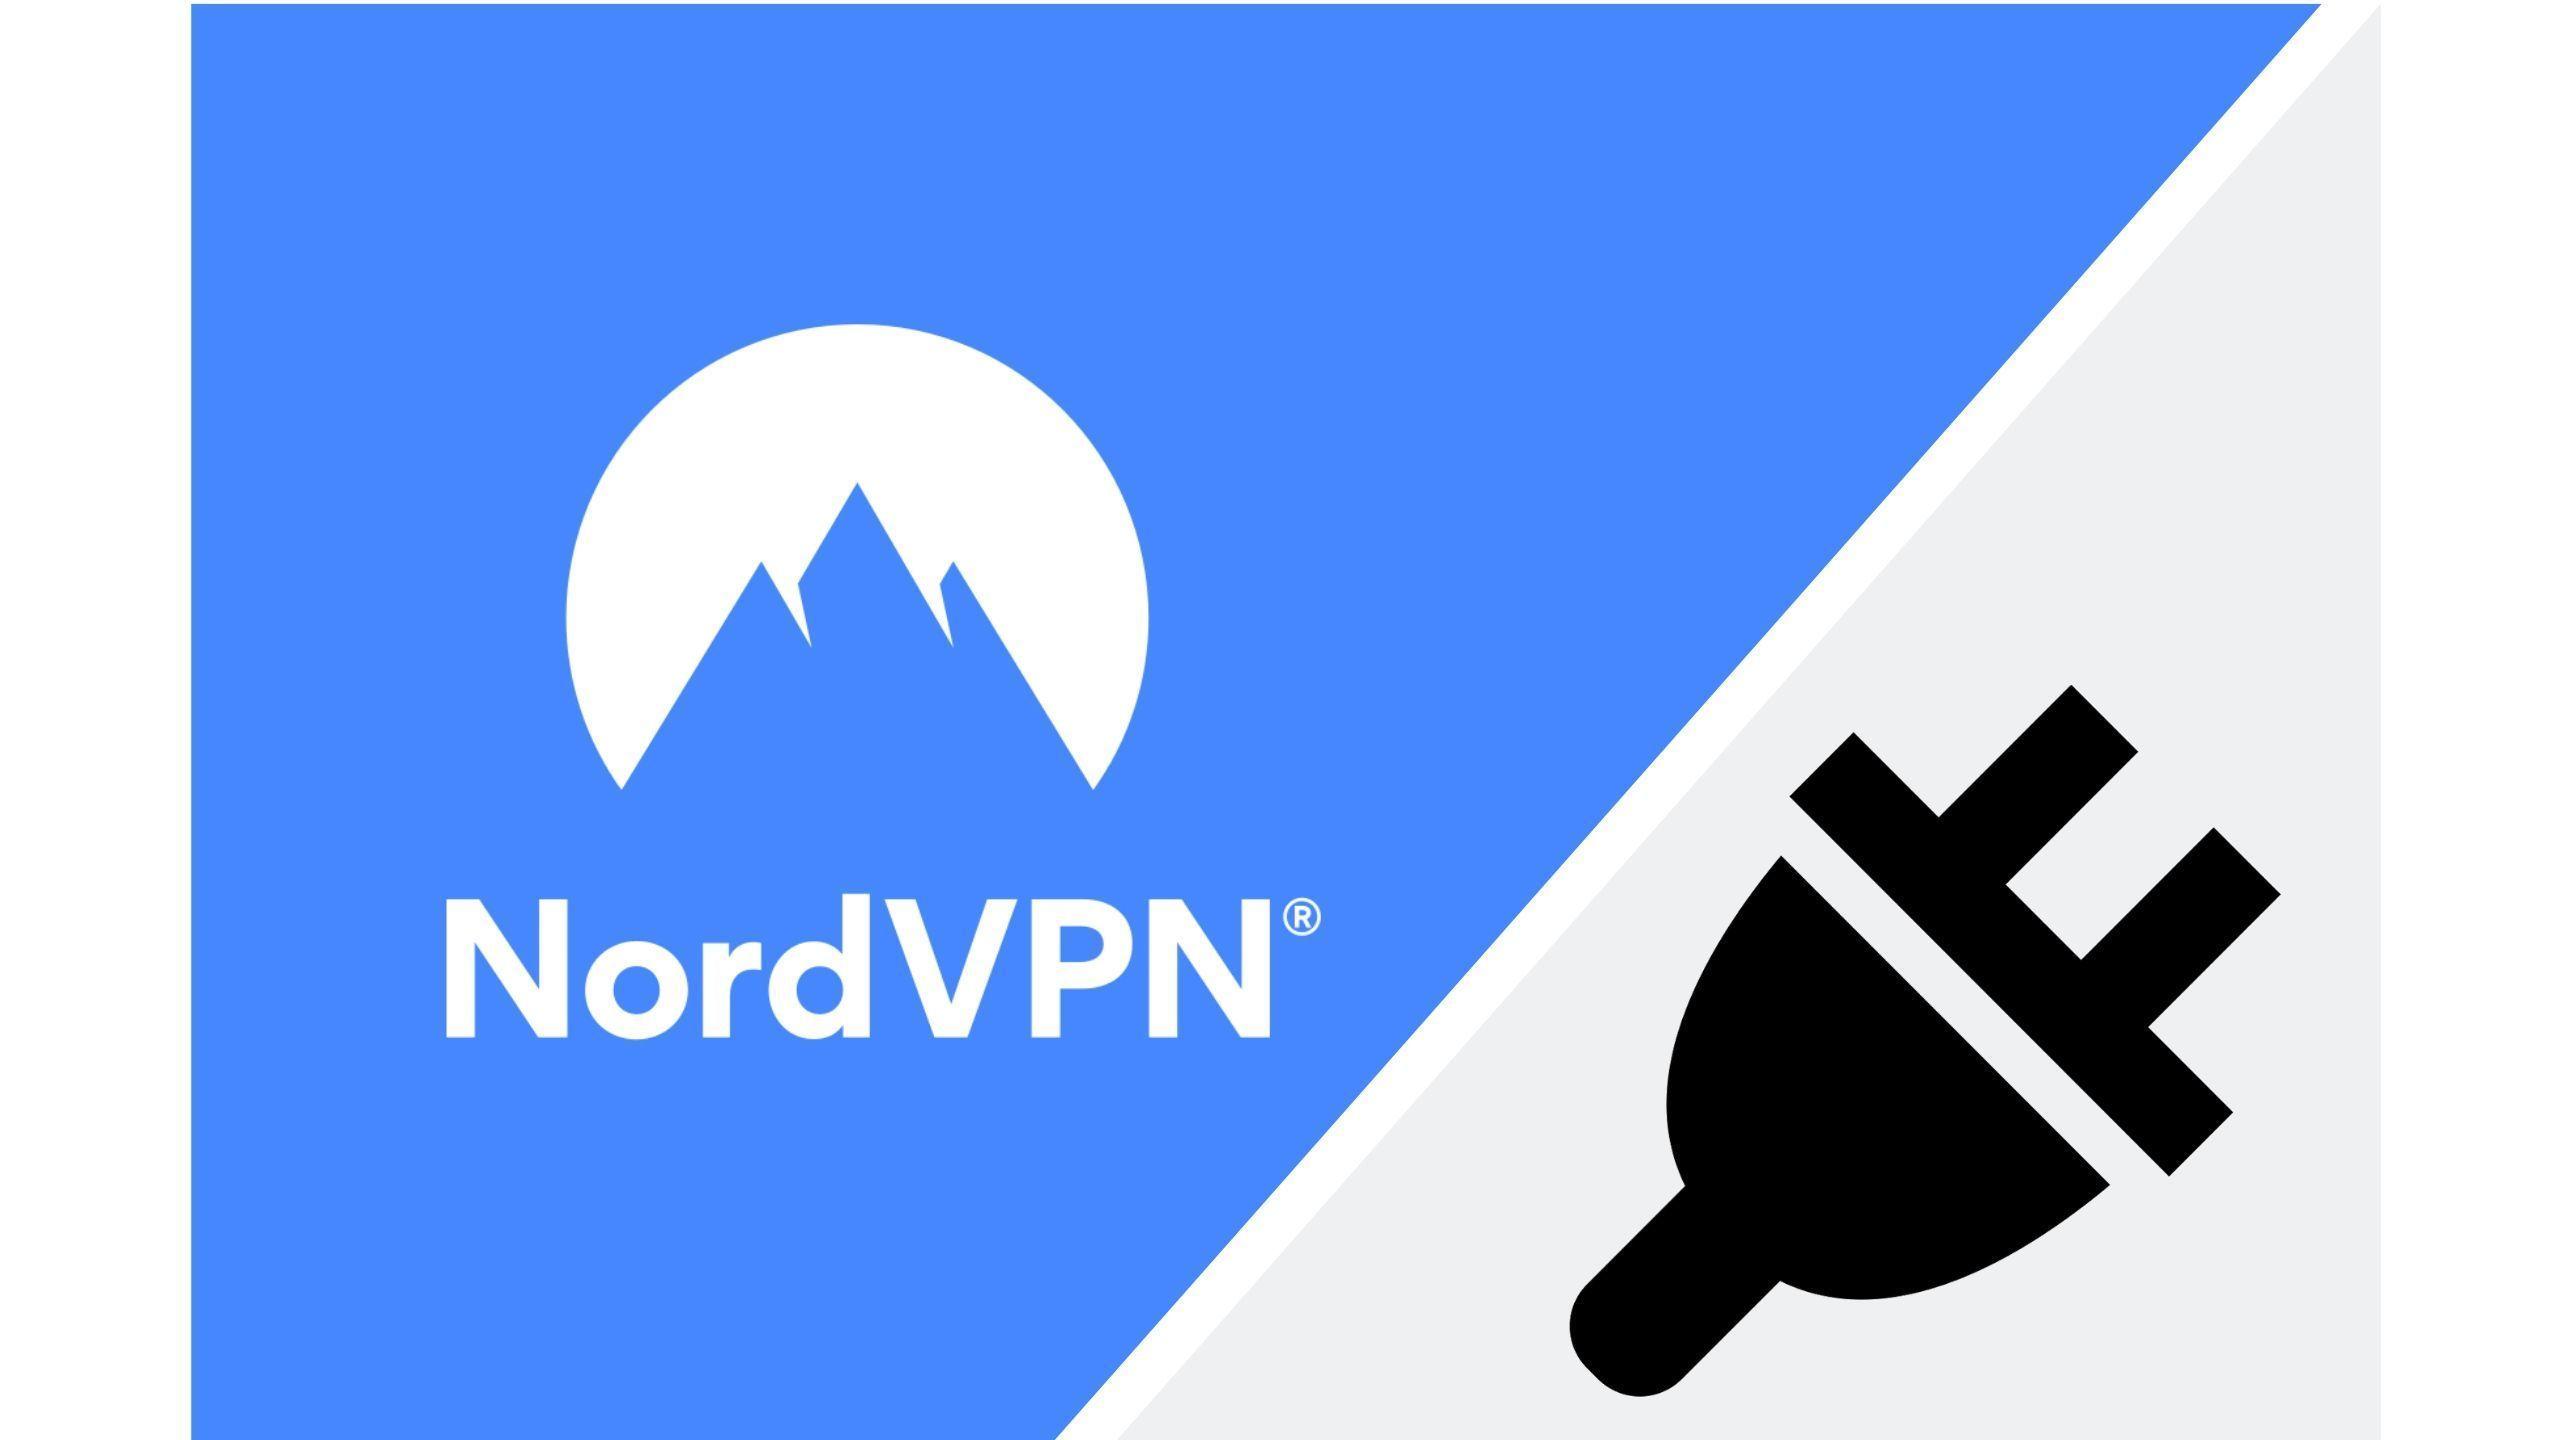 NordVPN Test 2019 - Bekannt, beliebt und gut? techboys.de • smarte News, auf den Punkt!